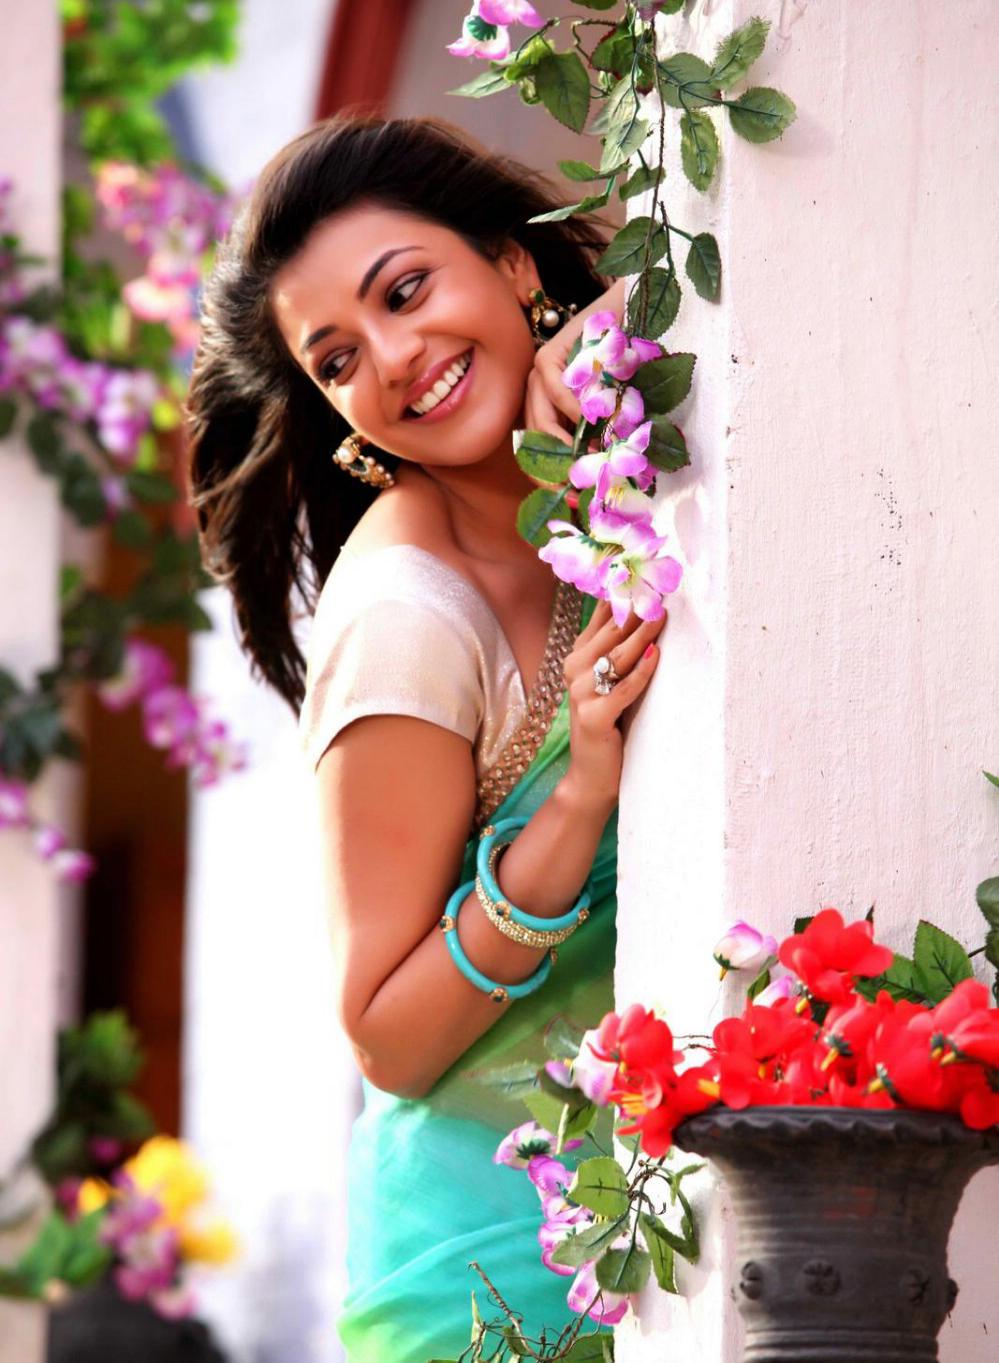 Kajal Agarwal In Jilla 57451 Kajal Agarwal - Kajal Aggarwal , HD Wallpaper & Backgrounds